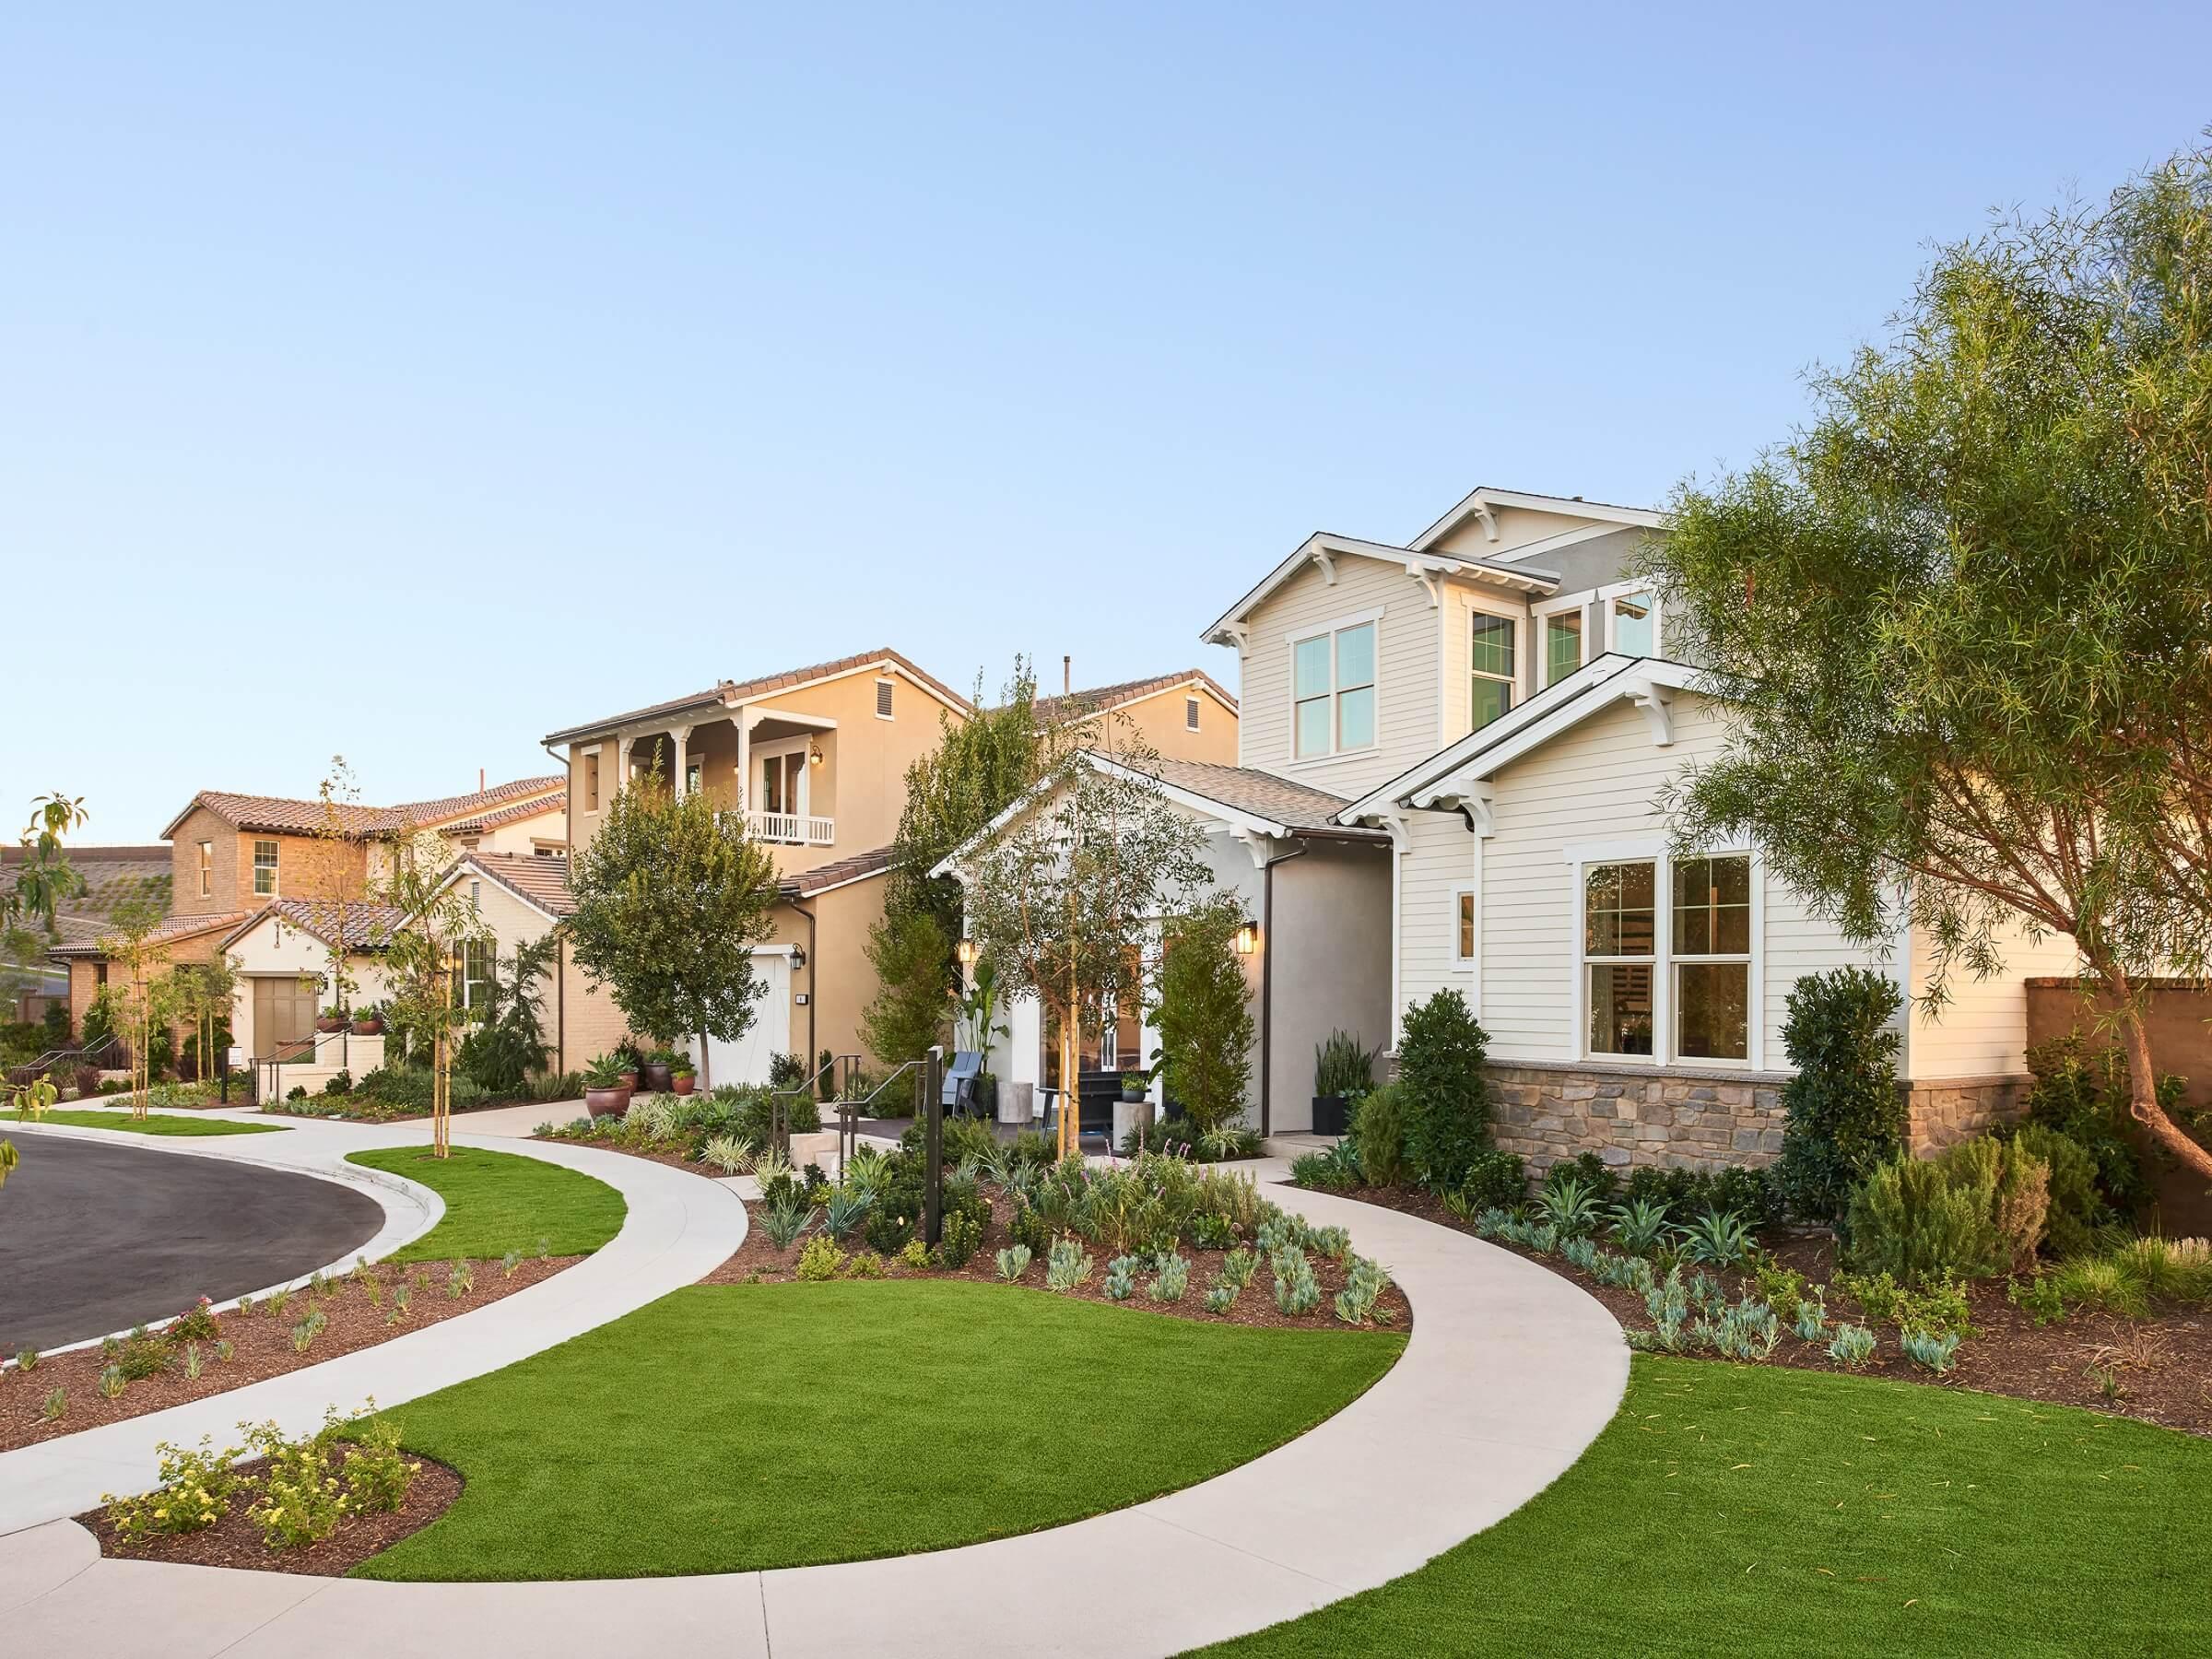 'Single Family' building or community at 'Briosa at Esencia Ladera Ranch, California 92694 United States'